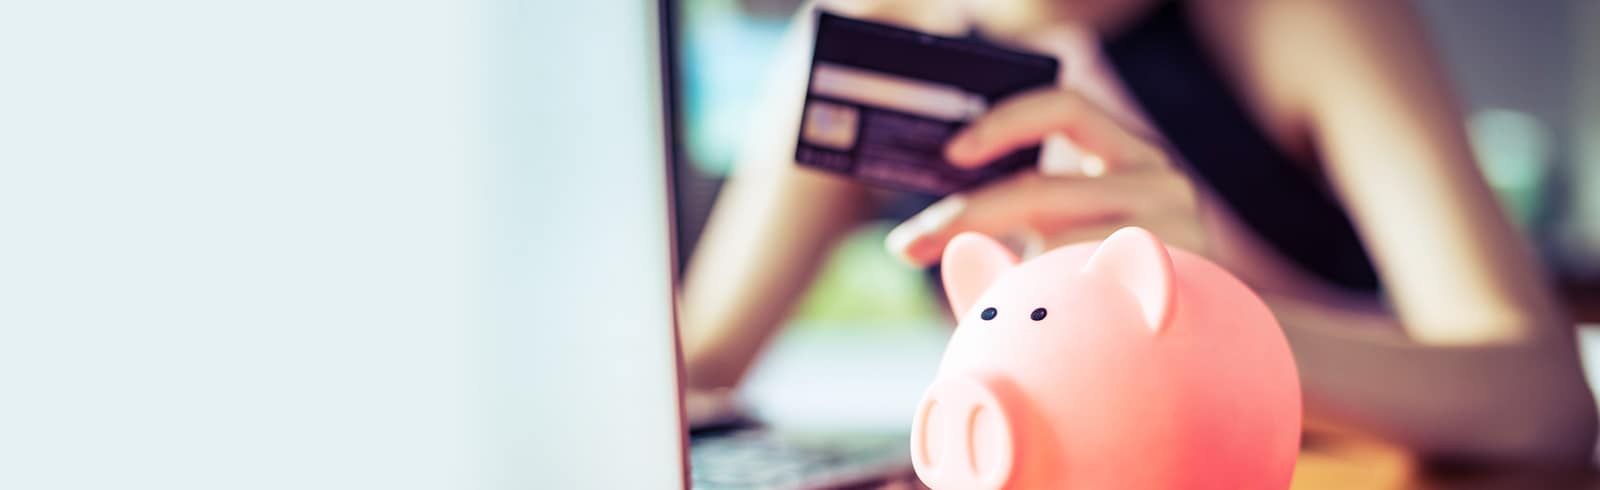 Sh onlineshoppingtricks spreecreditcards